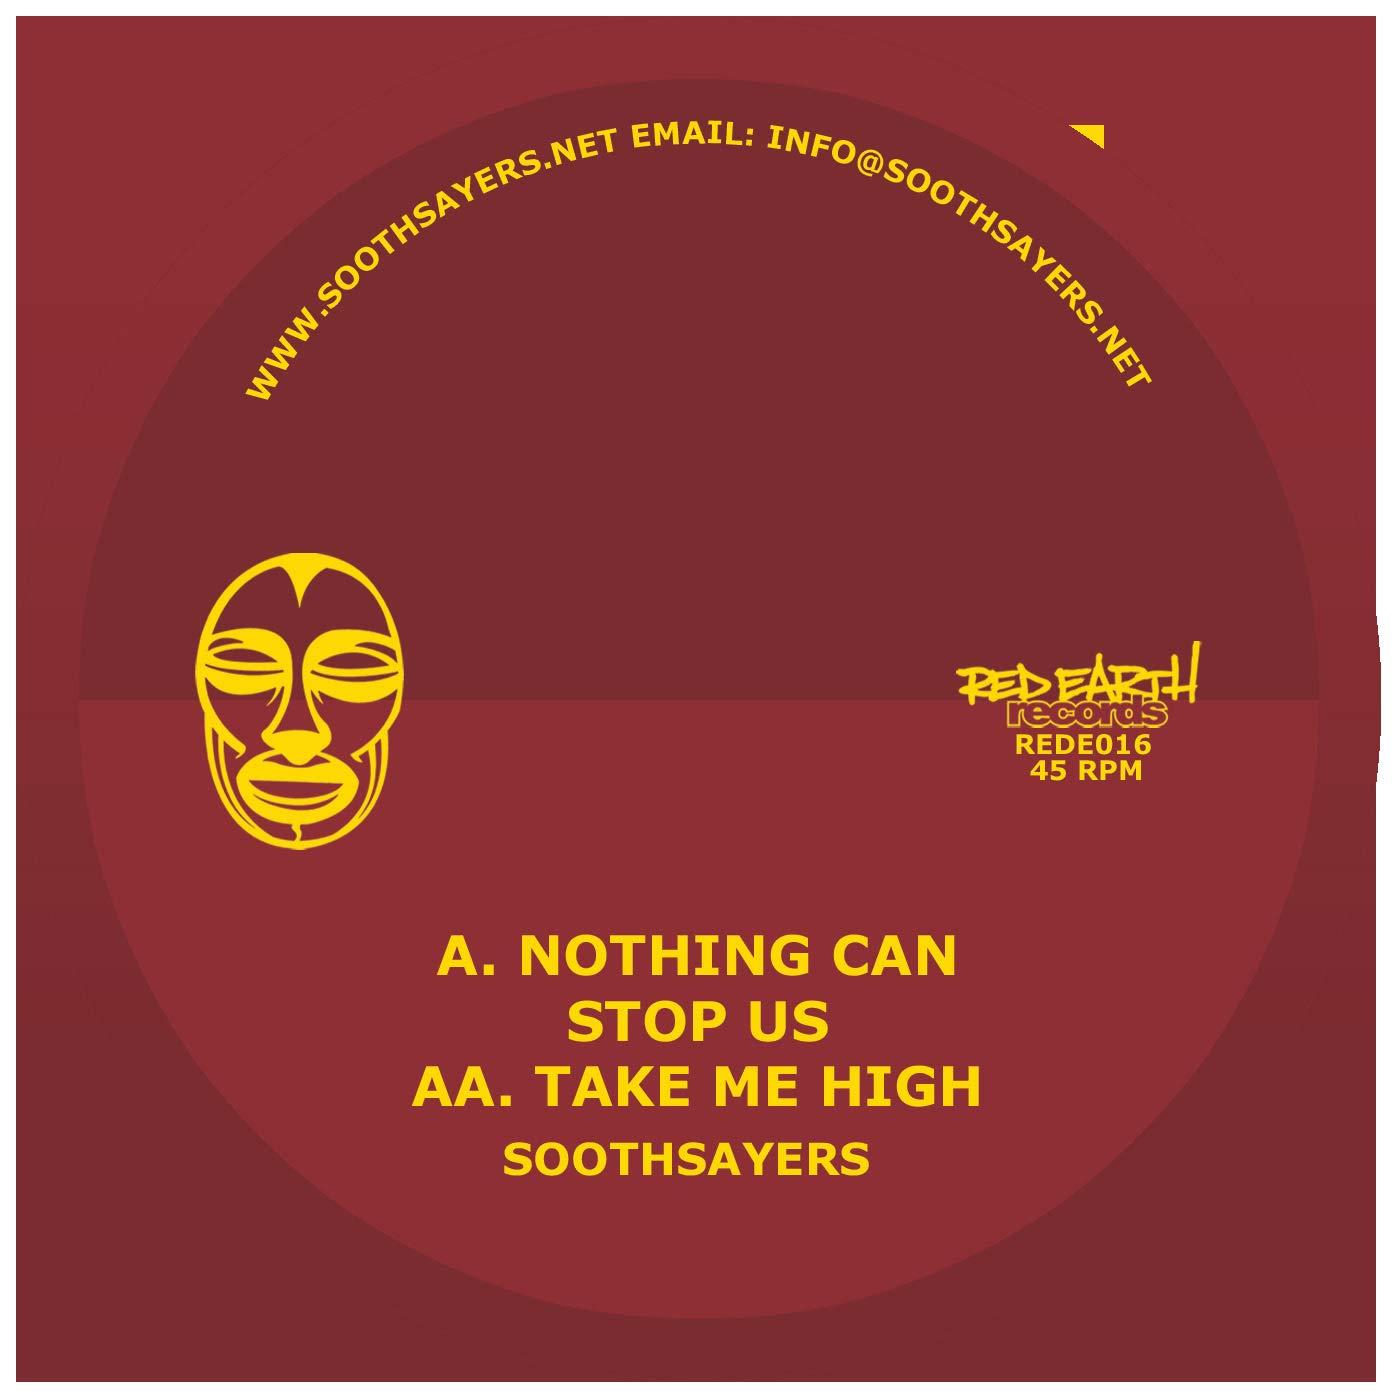 Nothing Can Stop Us/Take Me Hi [7 inch Analog]                                                                                                                                                                                                                                                                                                                                                                                                <span class=